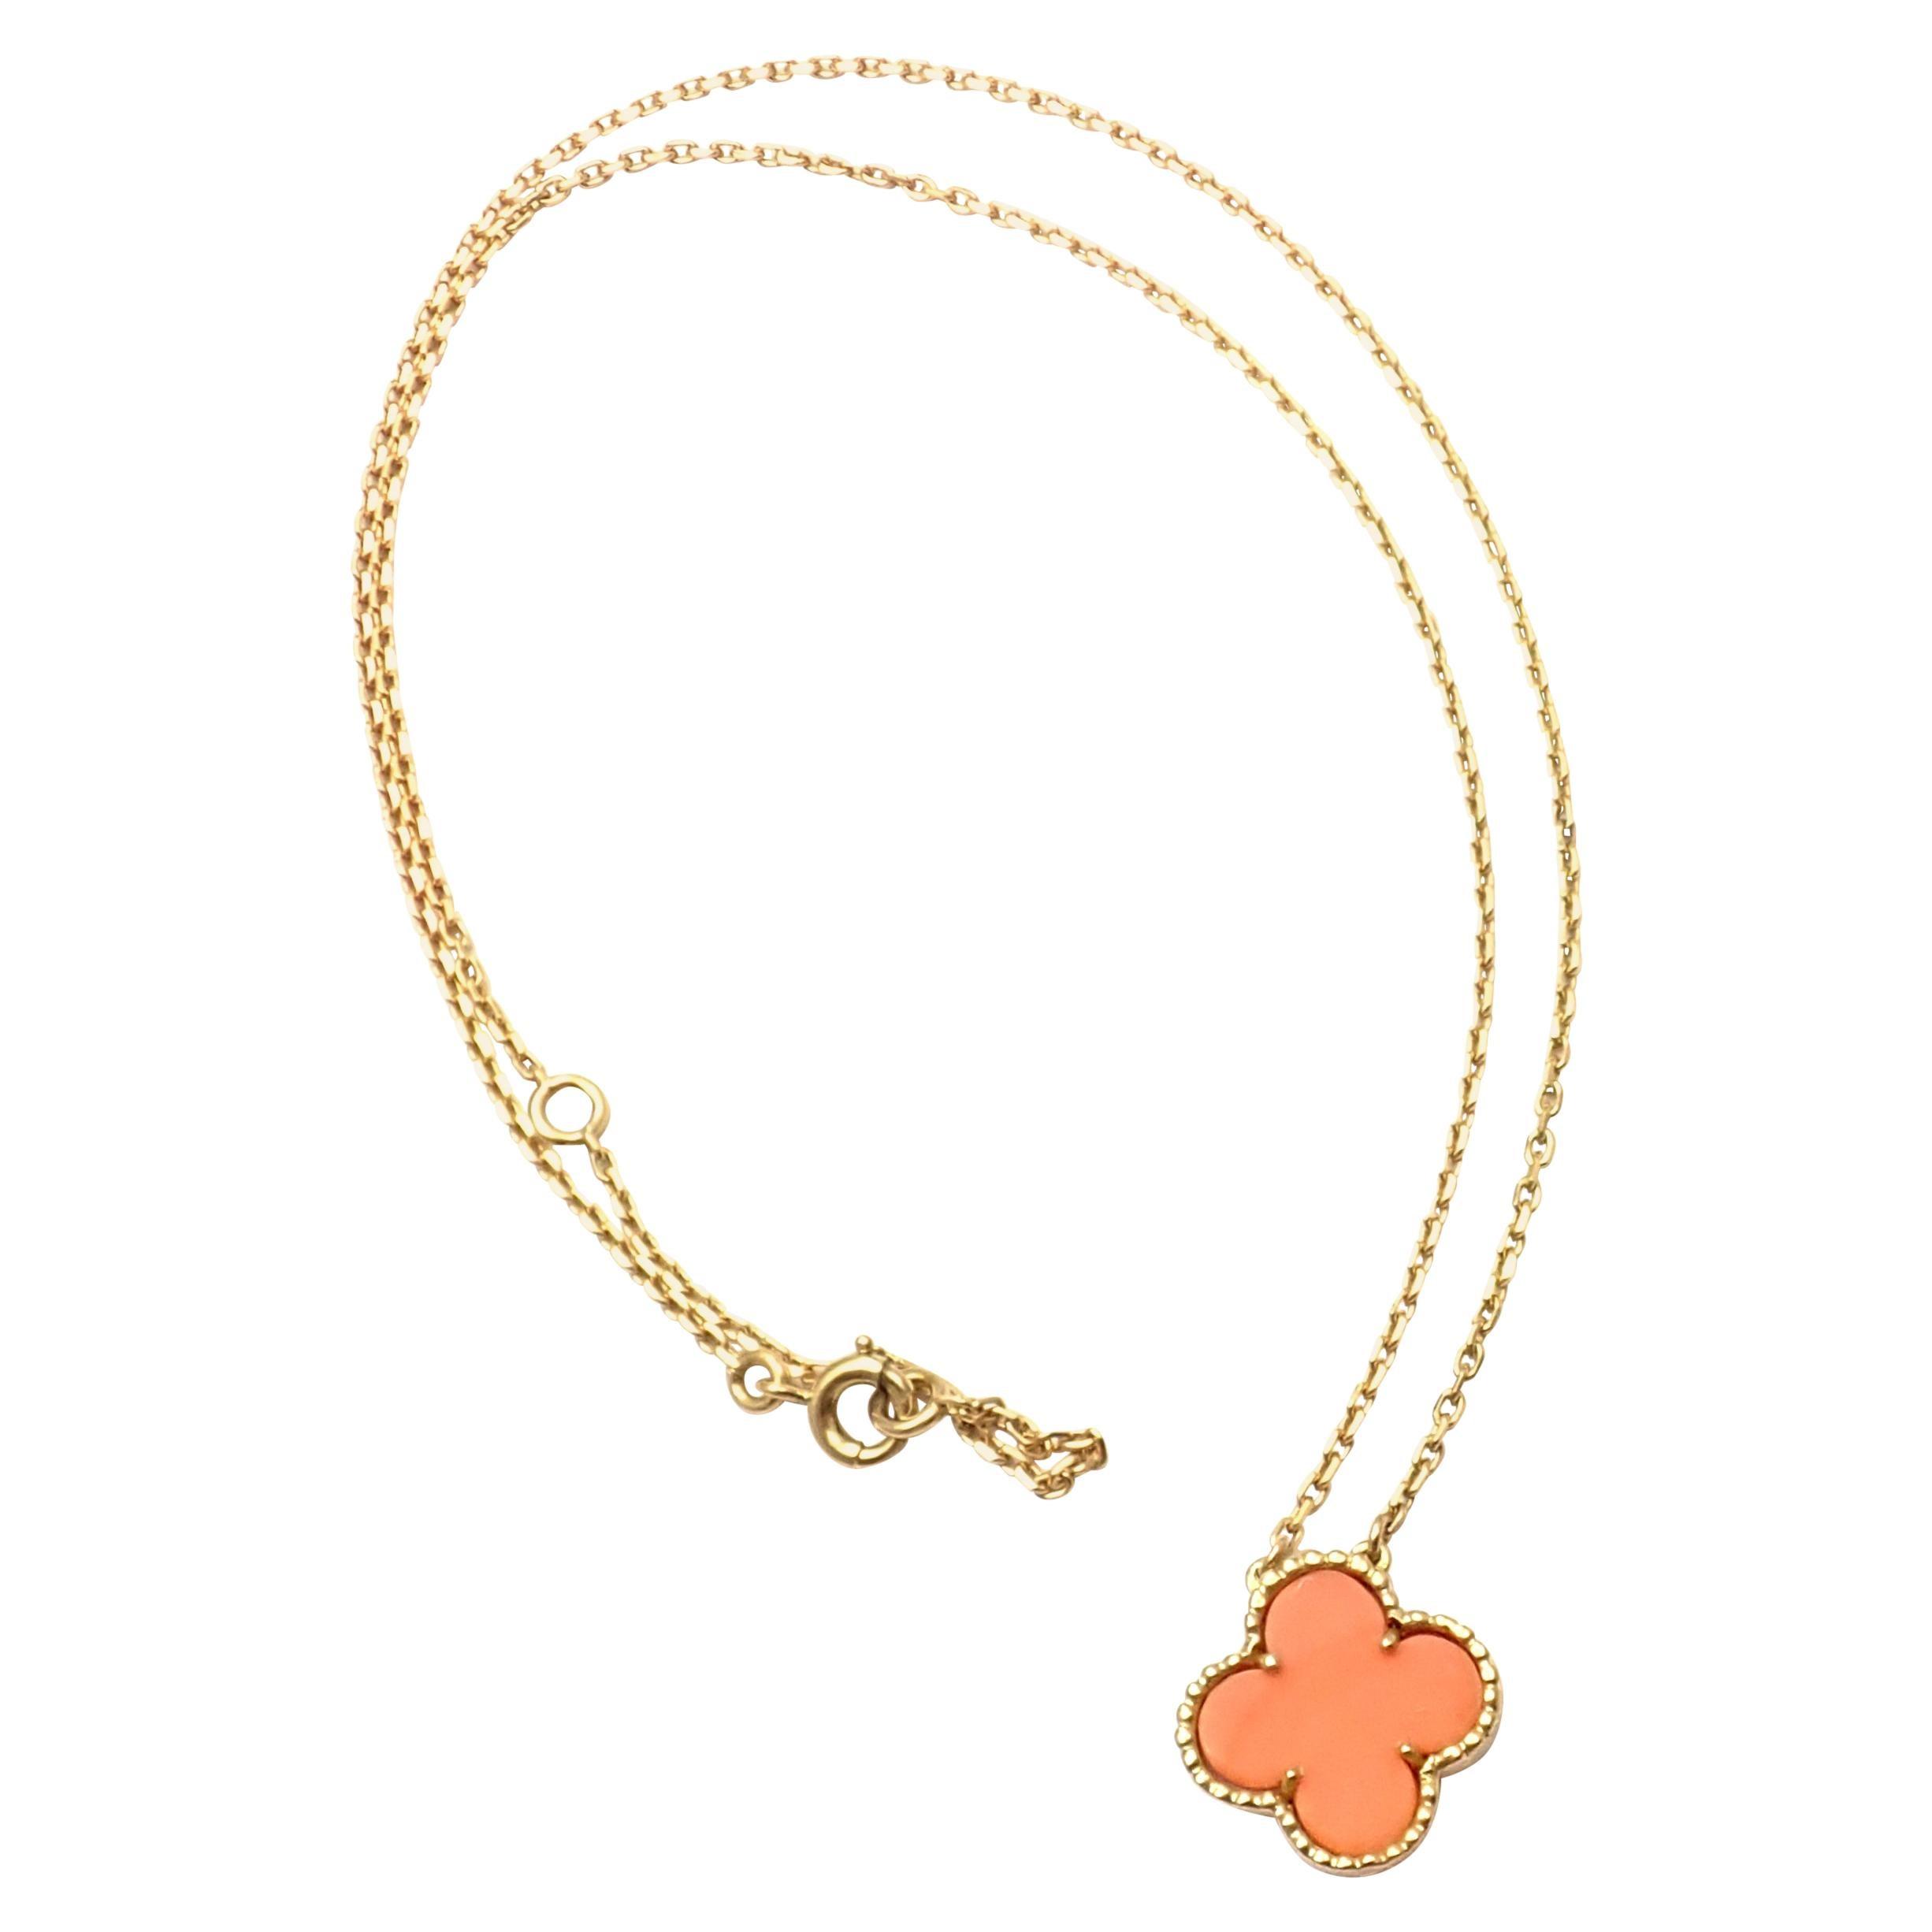 Van Cleef & Arpels Vintage Alhambra Coral Yellow Gold Pendant Necklace